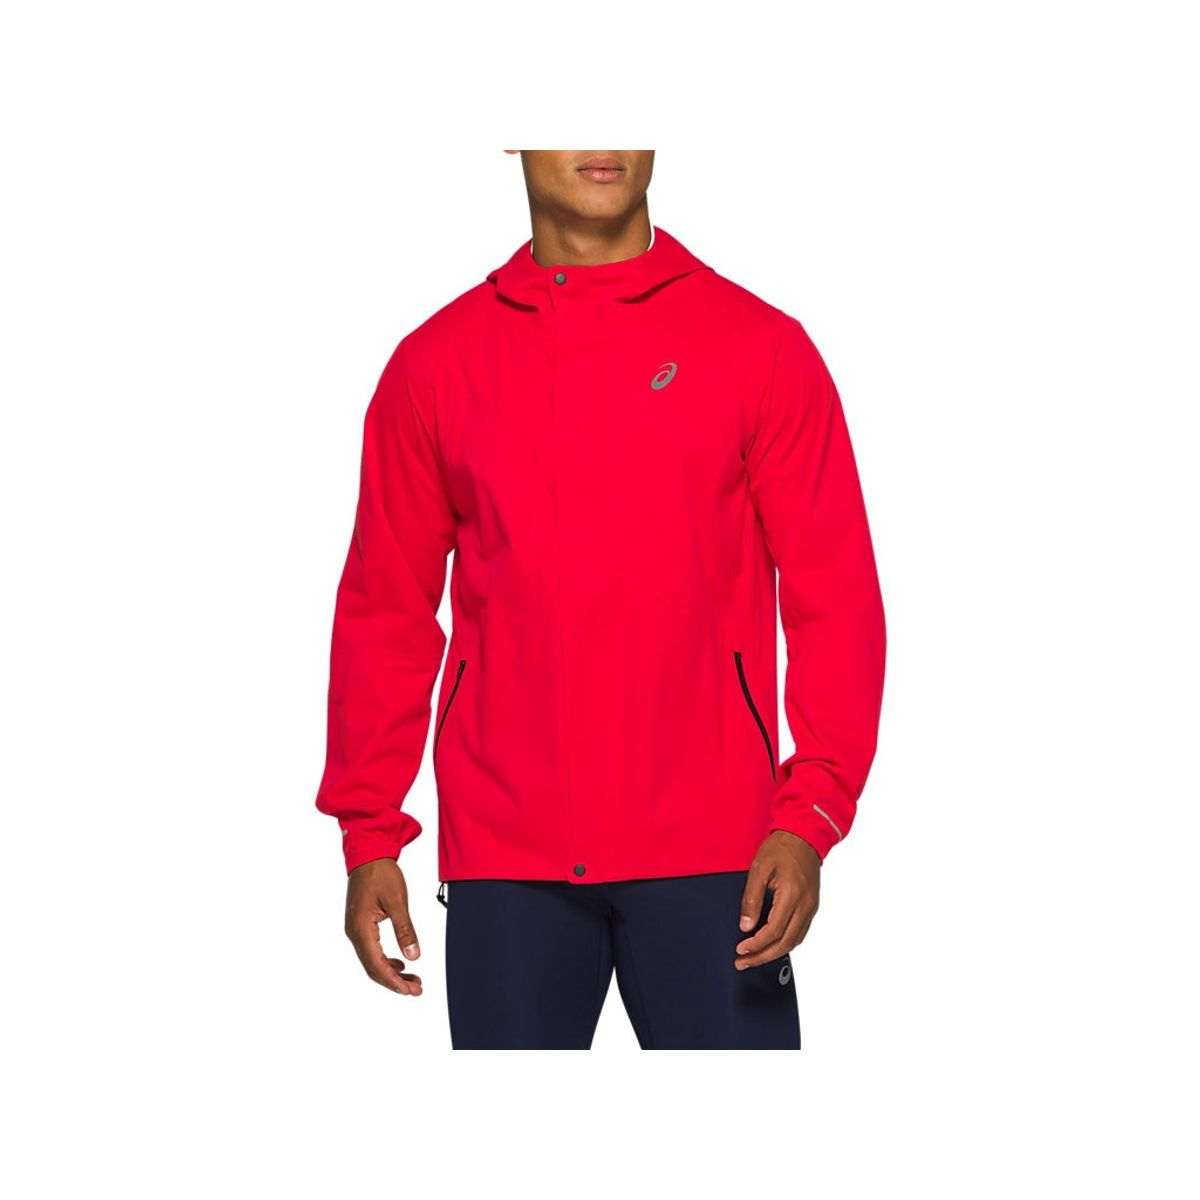 Jaqueta-ASICS-Accelerate---Vermelho---Masculino